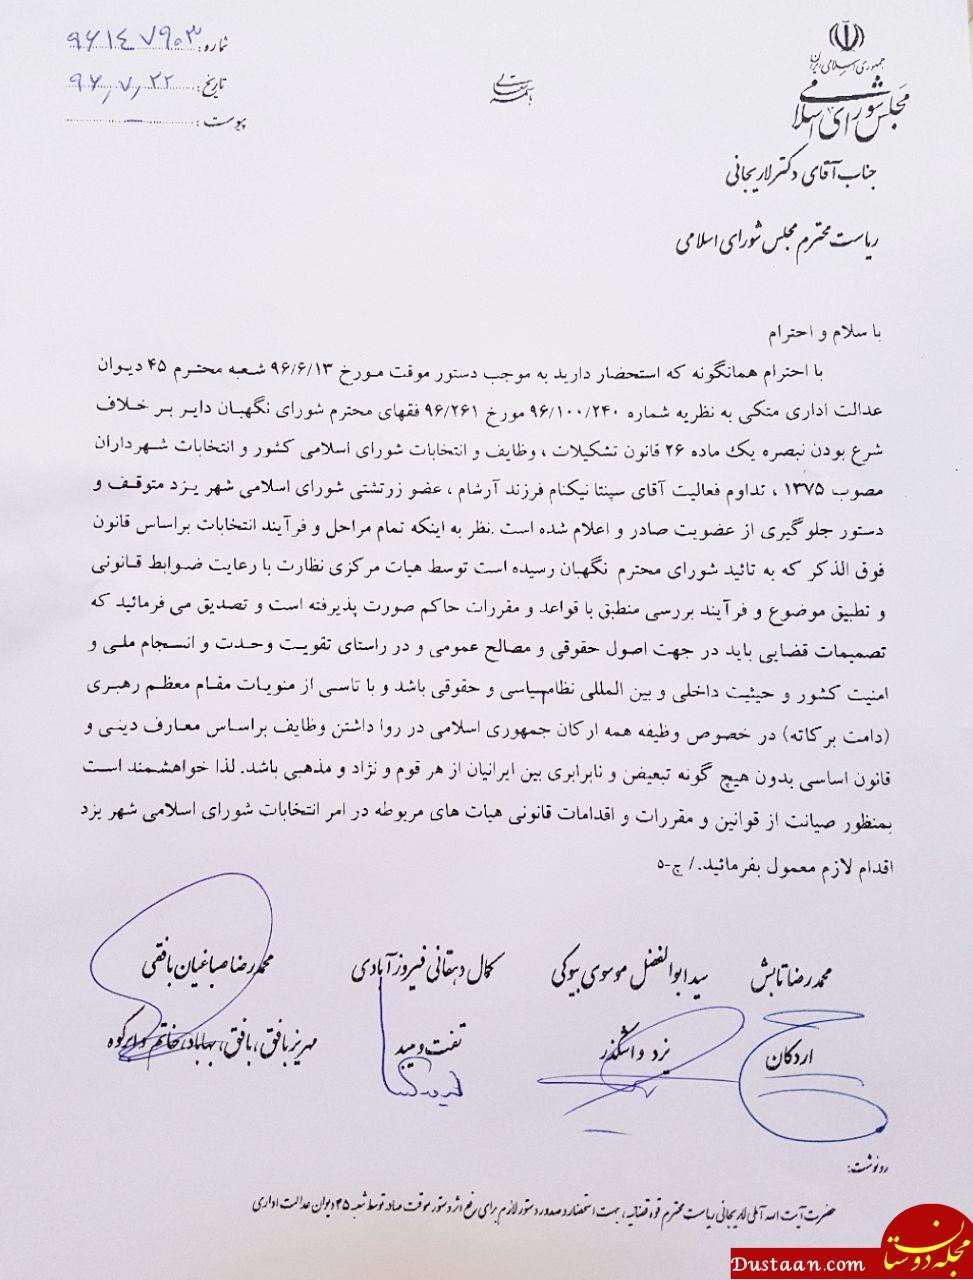 www.dustaan.com درخواست نمایندگان یزد از لاریجانی درباره سپنتا نیکنام +عکس